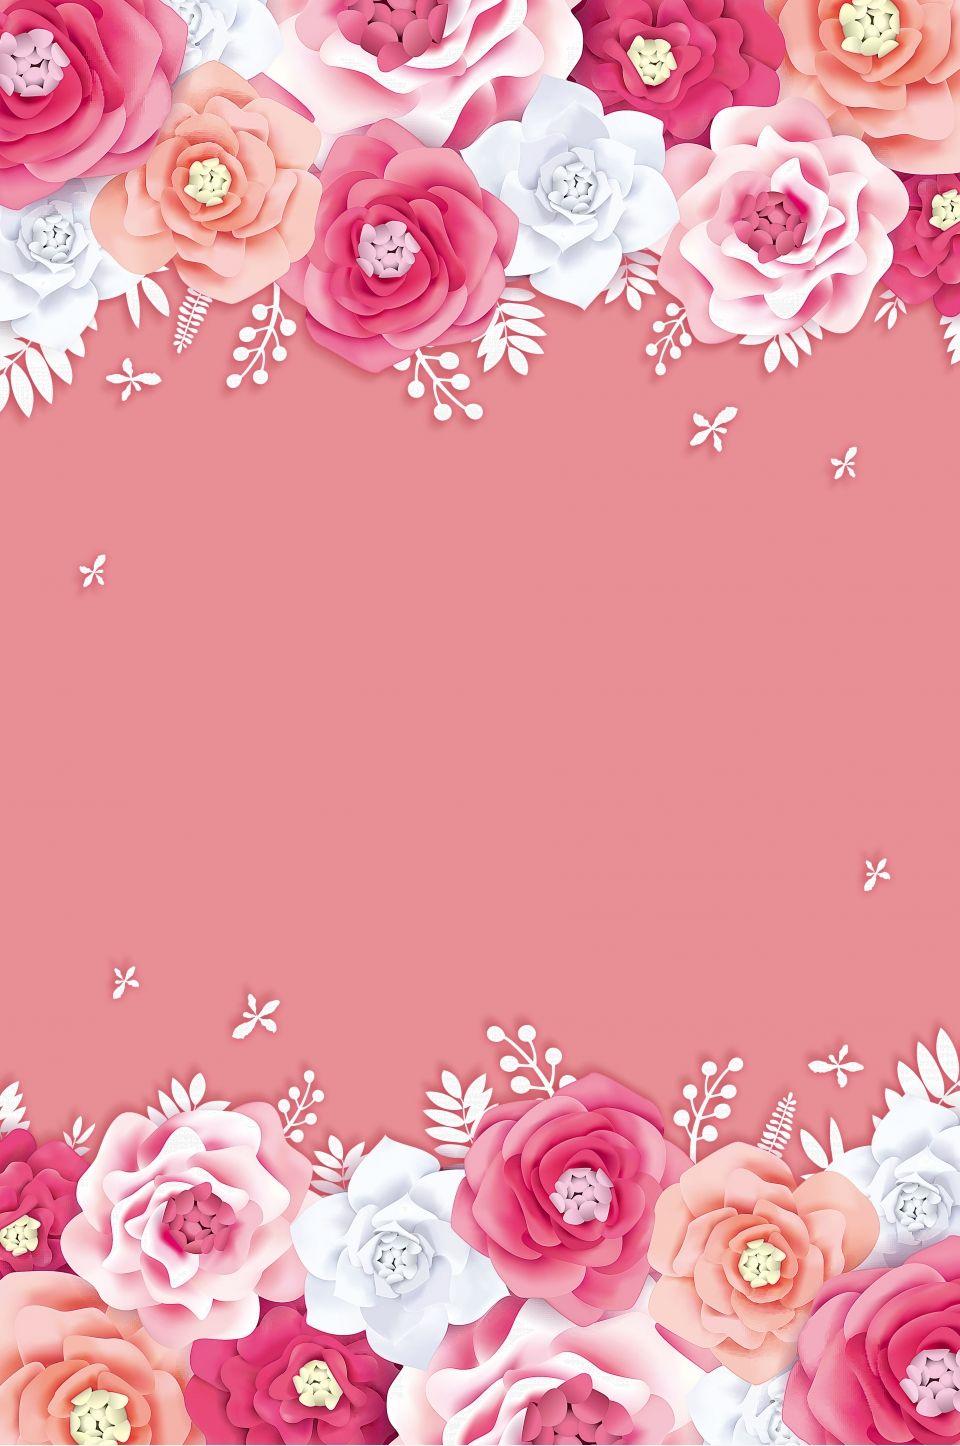 Bunga Kreatif Tmall Perkahwinan Ekspo Latar Belakang Hd Flower Background Wallpaper Wallpaper Nature Flowers Flower Backgrounds